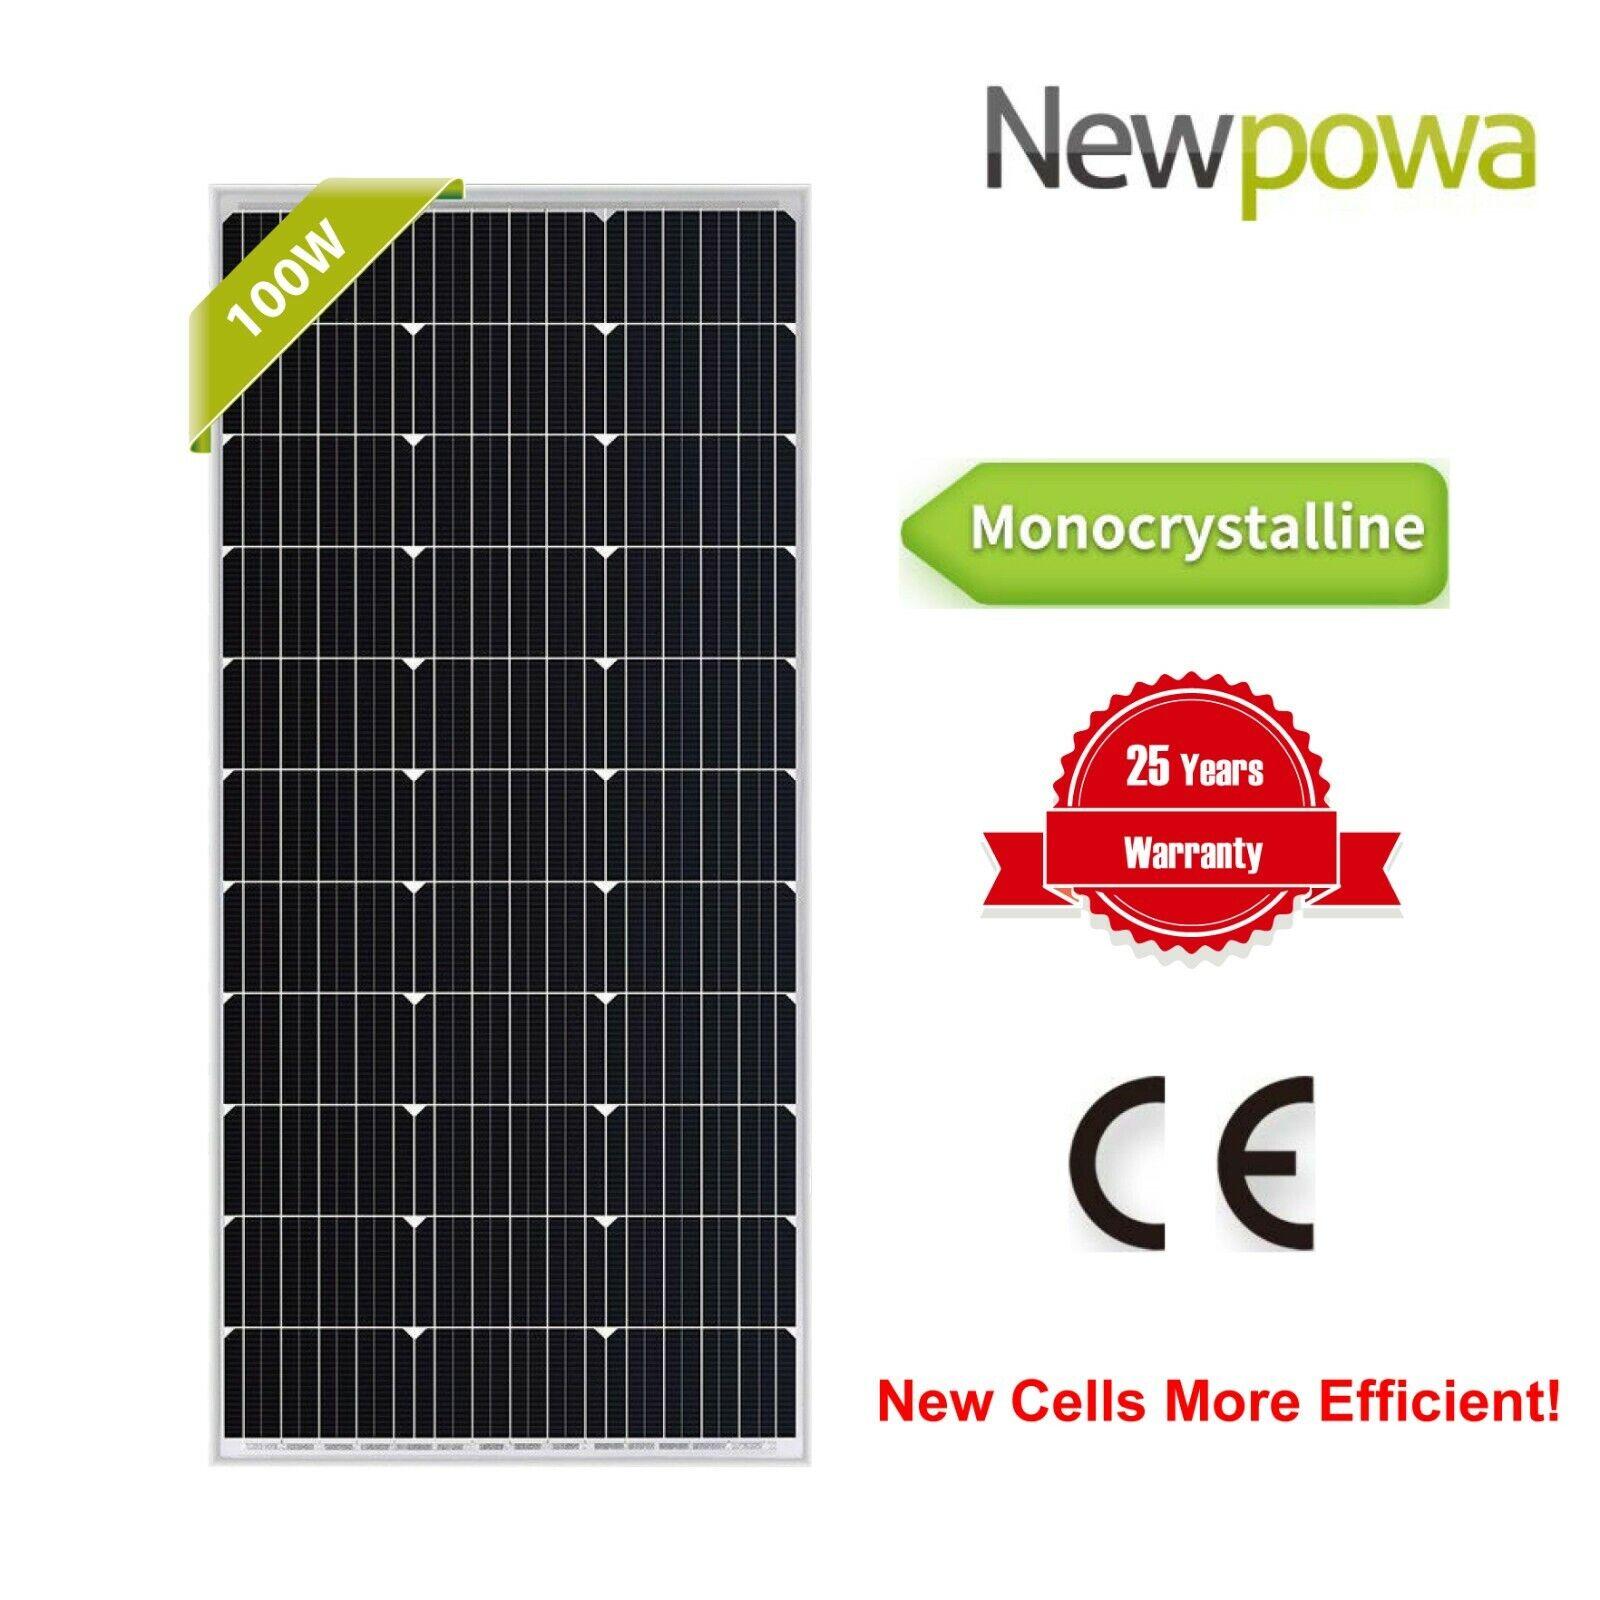 Newpowa 100W Watts 12V Monocrystalline Solar Panel Off Grid